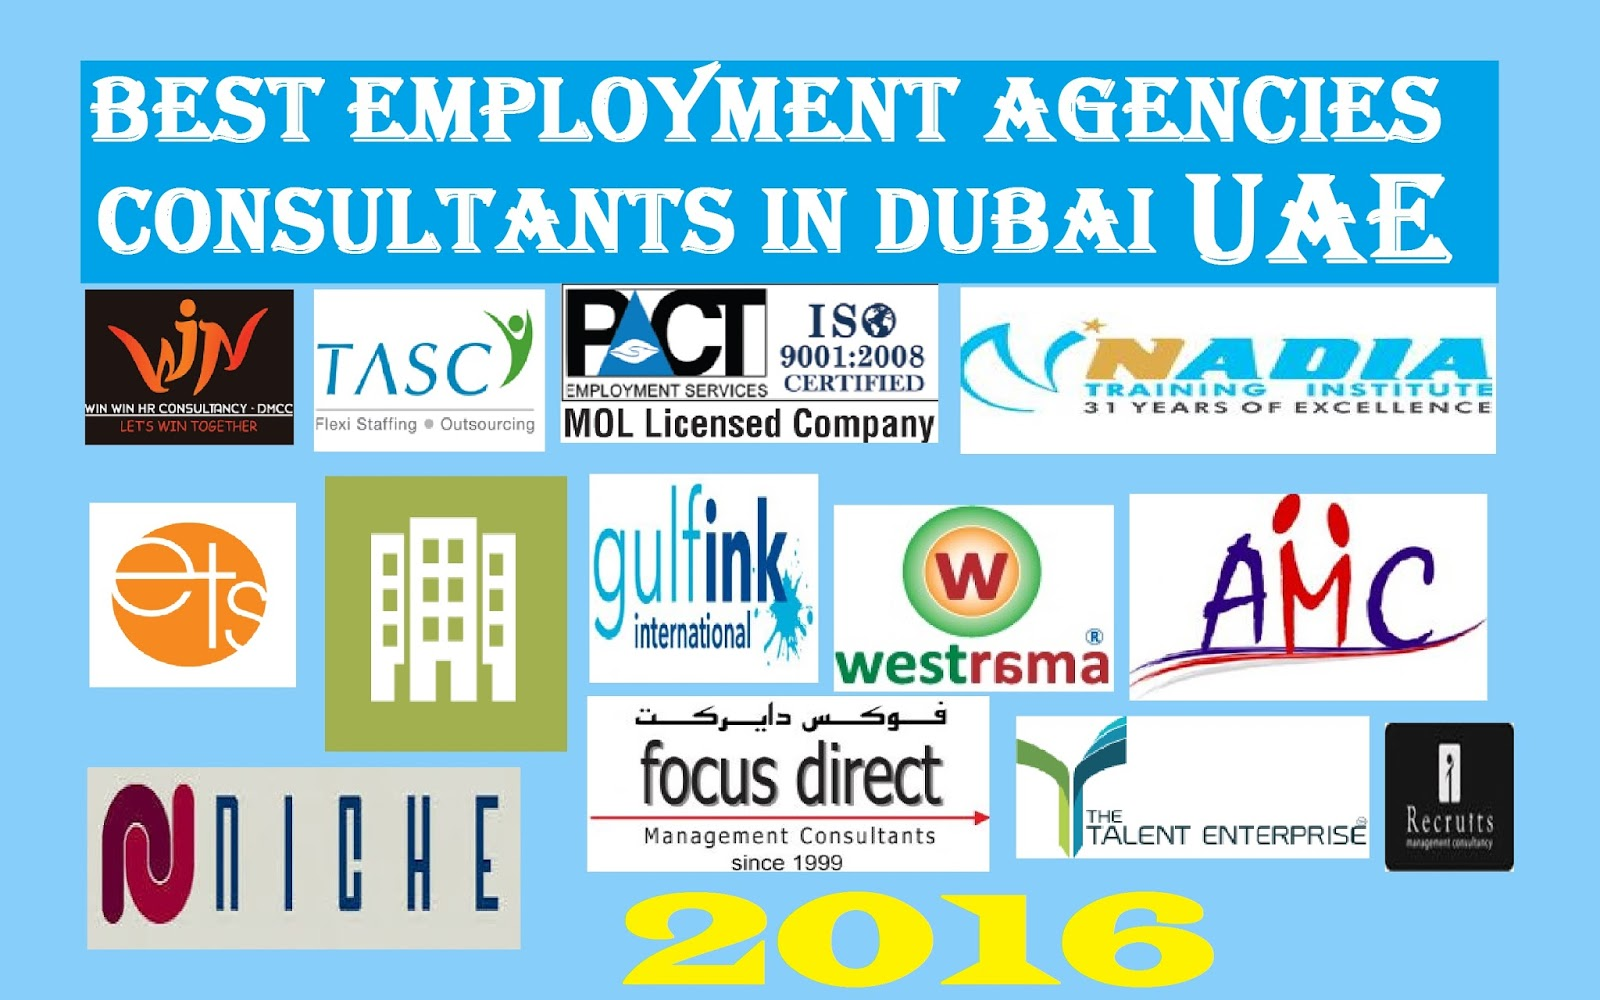 employment agencies and consultants in uae 2016 uaewikipedia rh top10dubai blogspot com